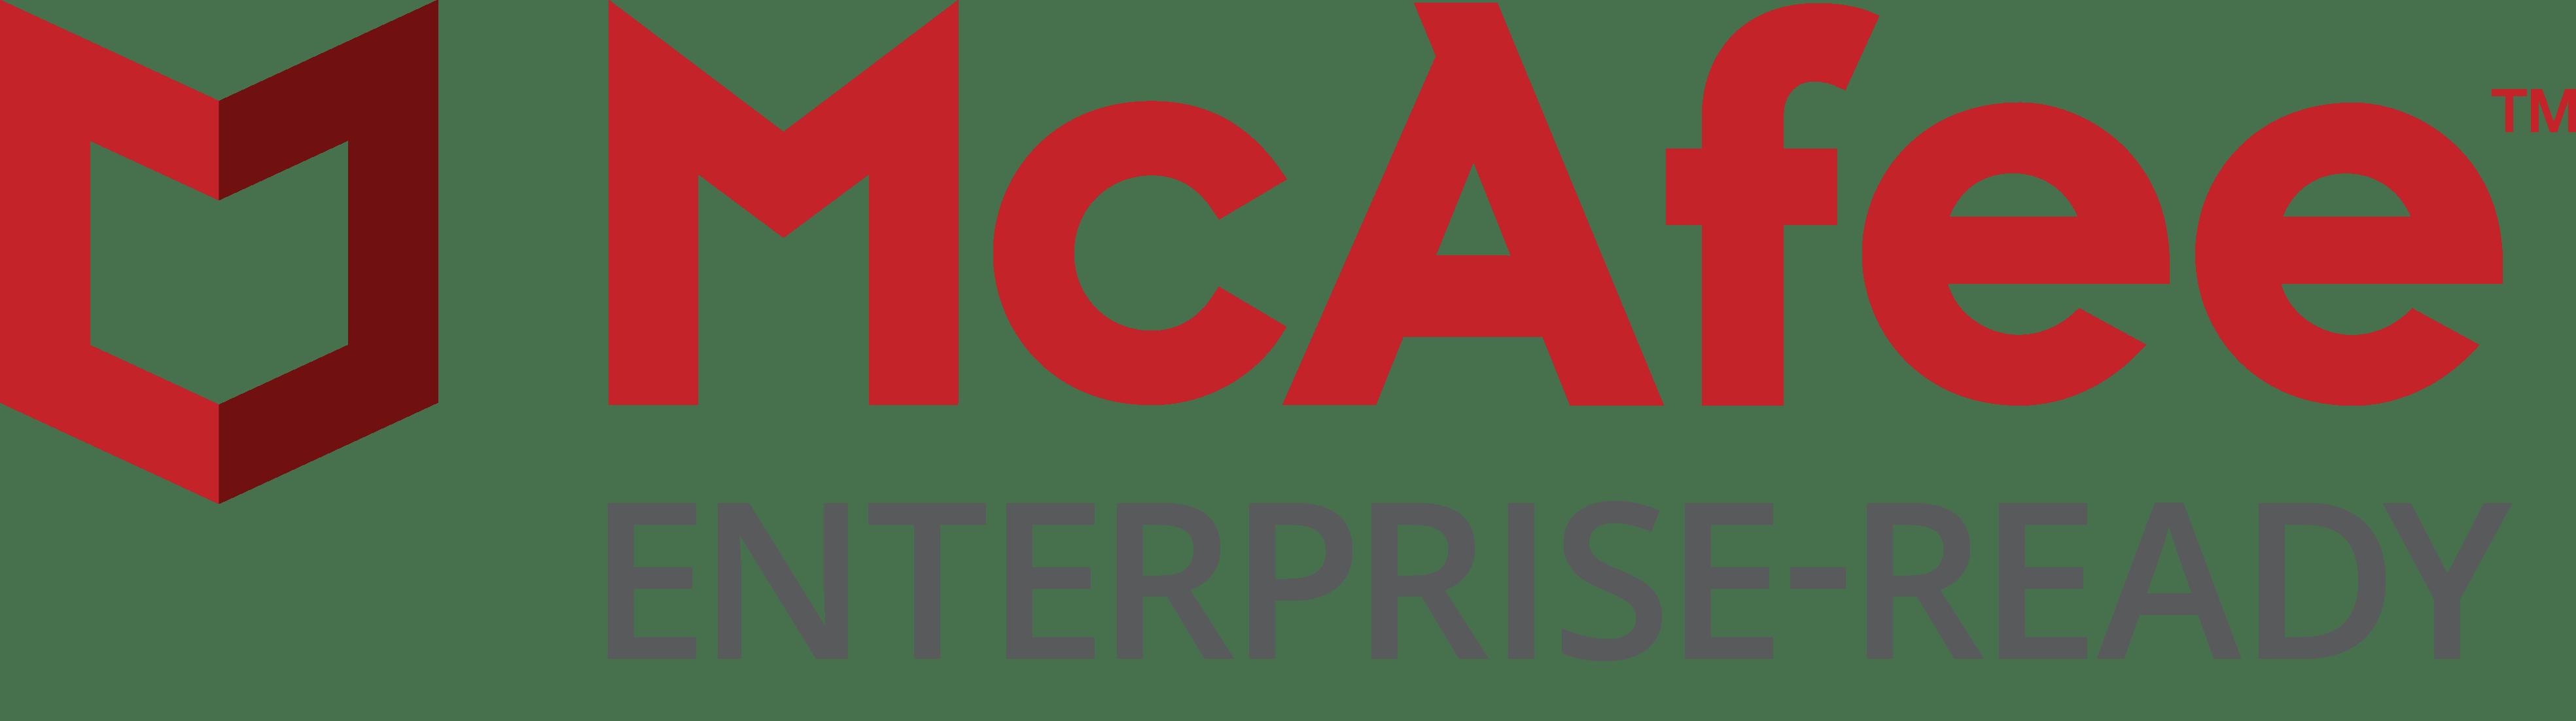 McAfee Enterprise Ready